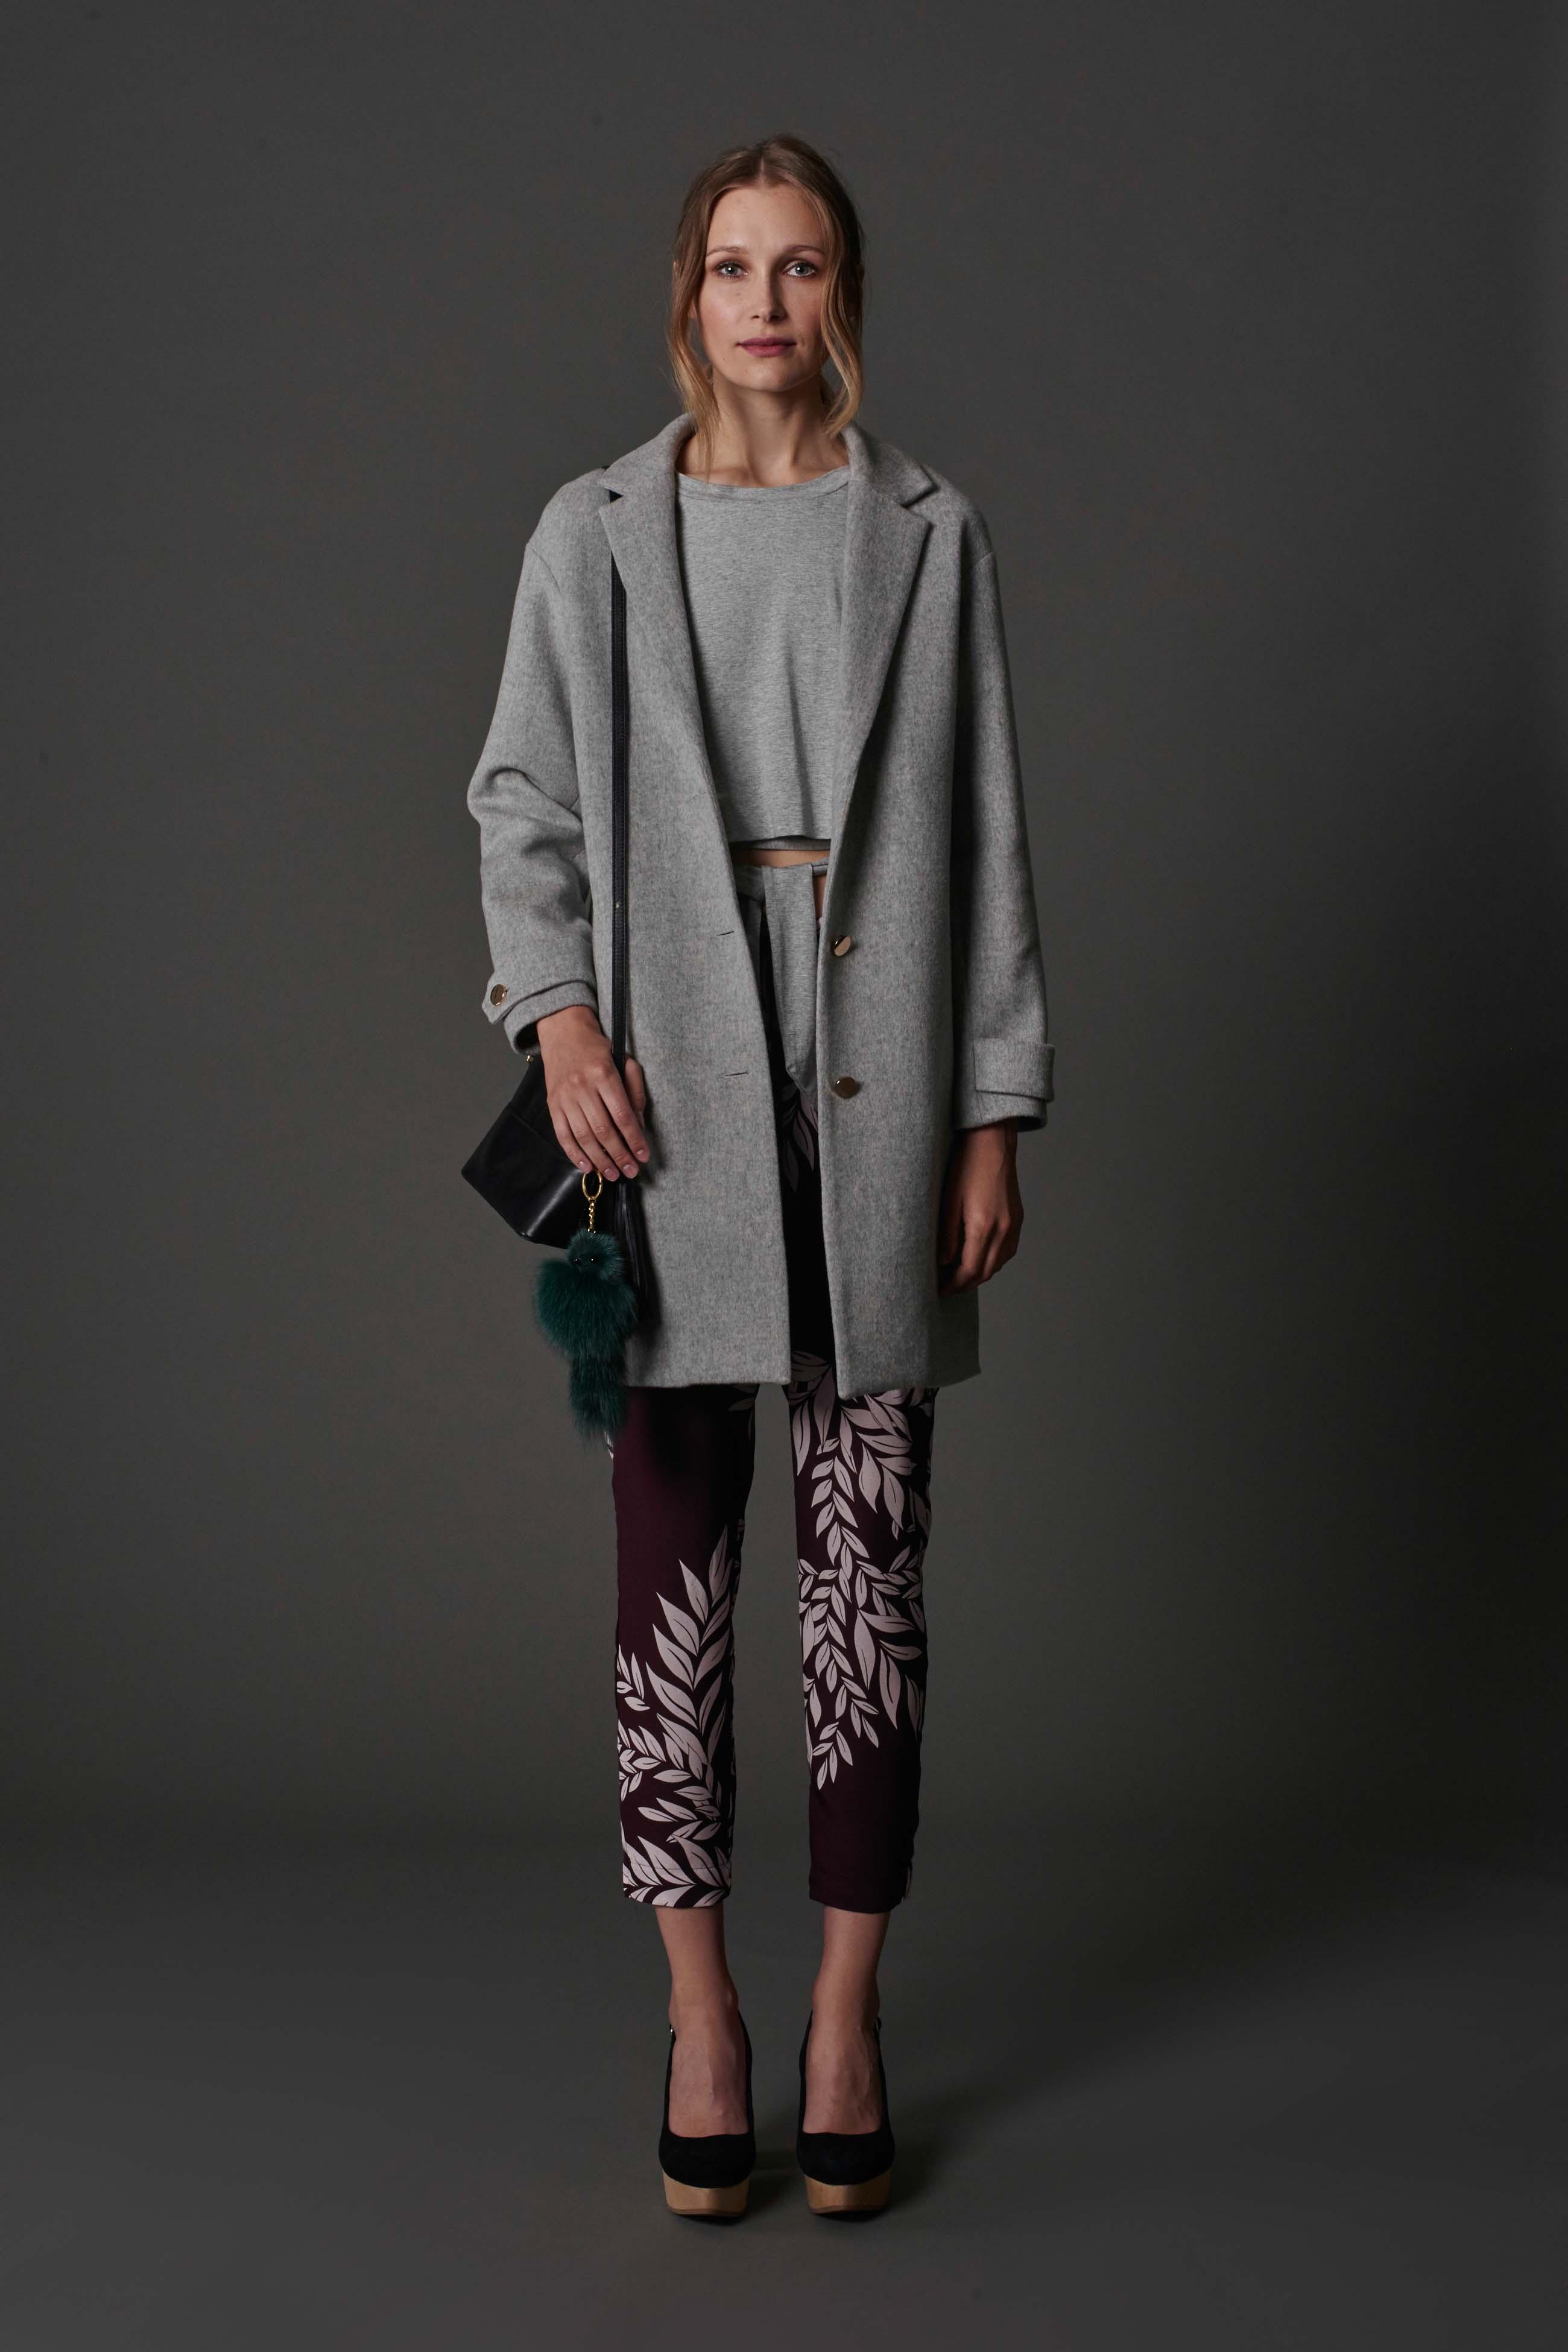 RUBY King Coat, Alta Wrap T-Shirt, Iva Trouser, Lila Shoulder Bag & Halo Heel